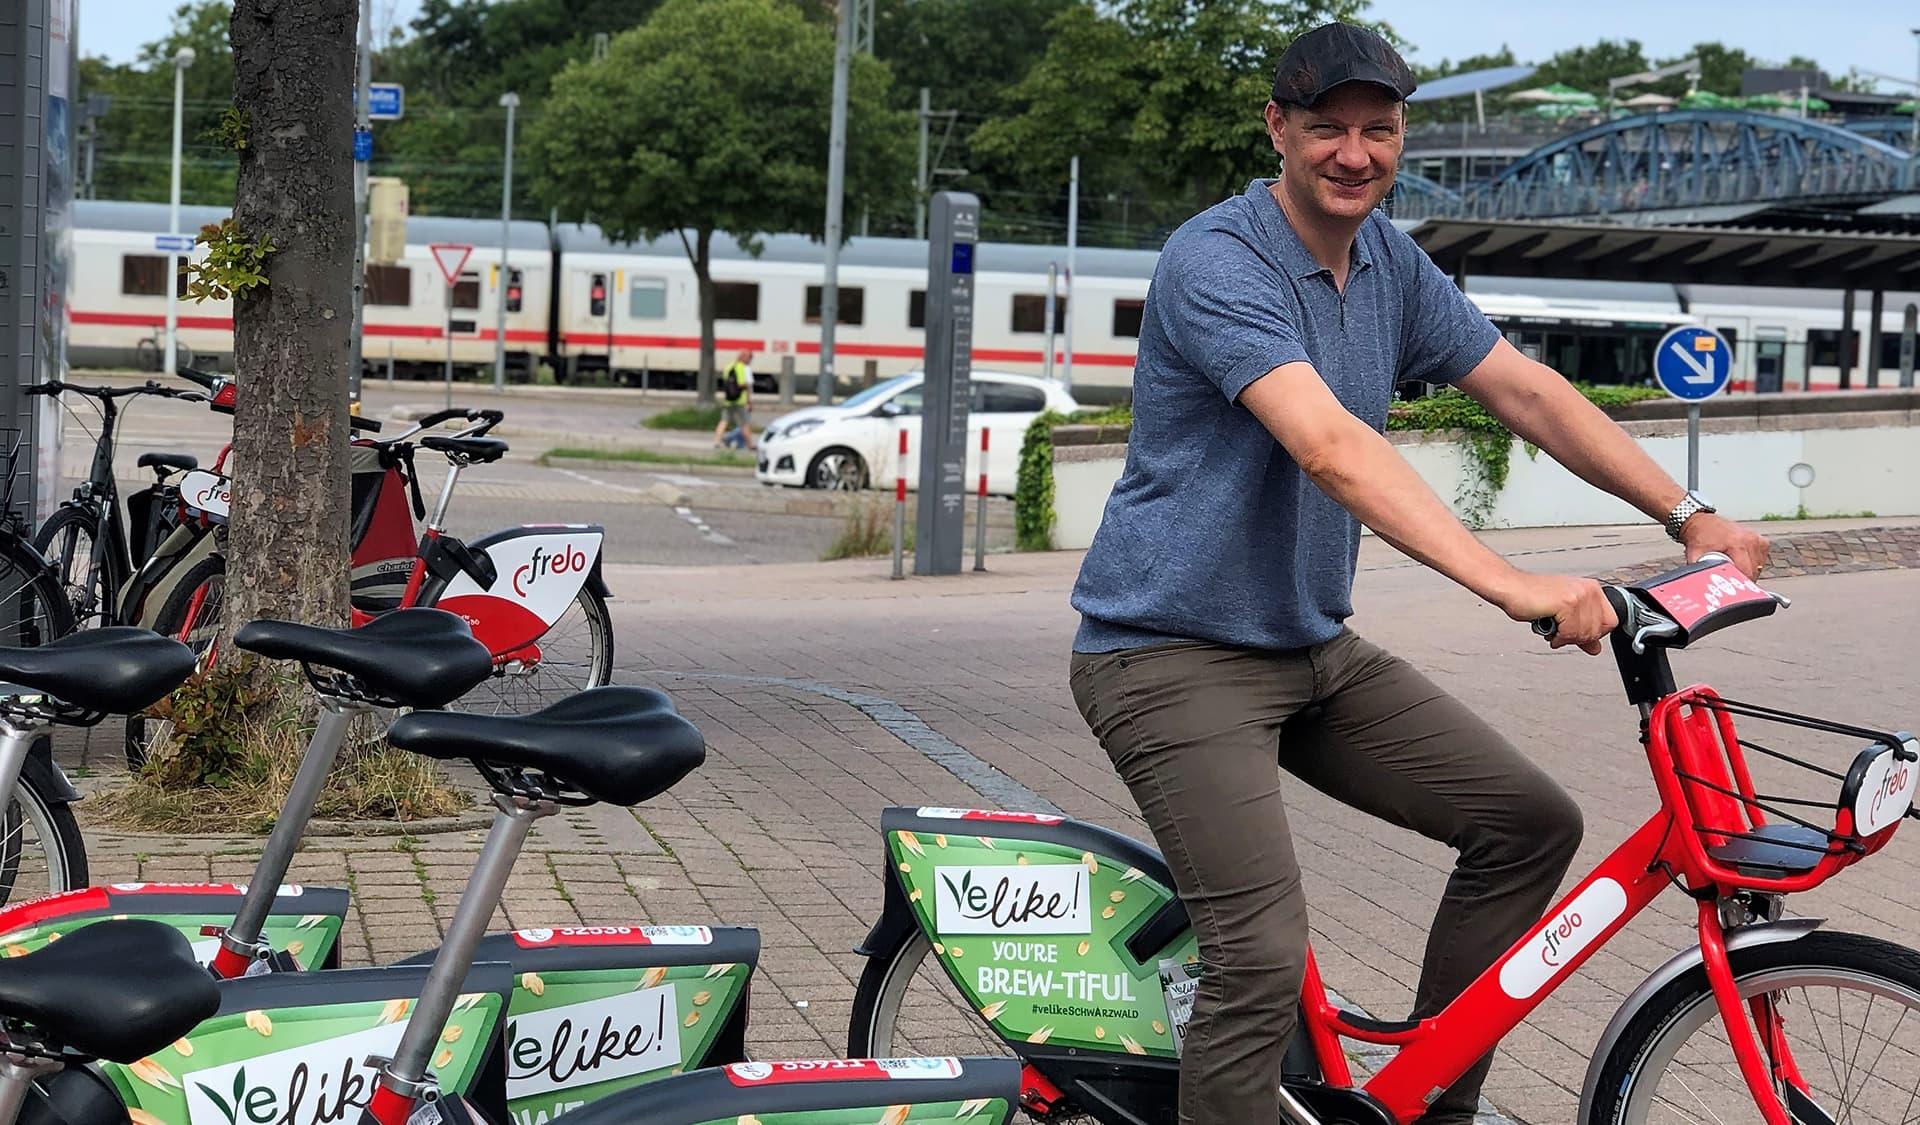 Andreas Helm, COO der Schwarzwaldmilch-Tochter Black Forest Nature GmbH auf Velike-Fahrrad